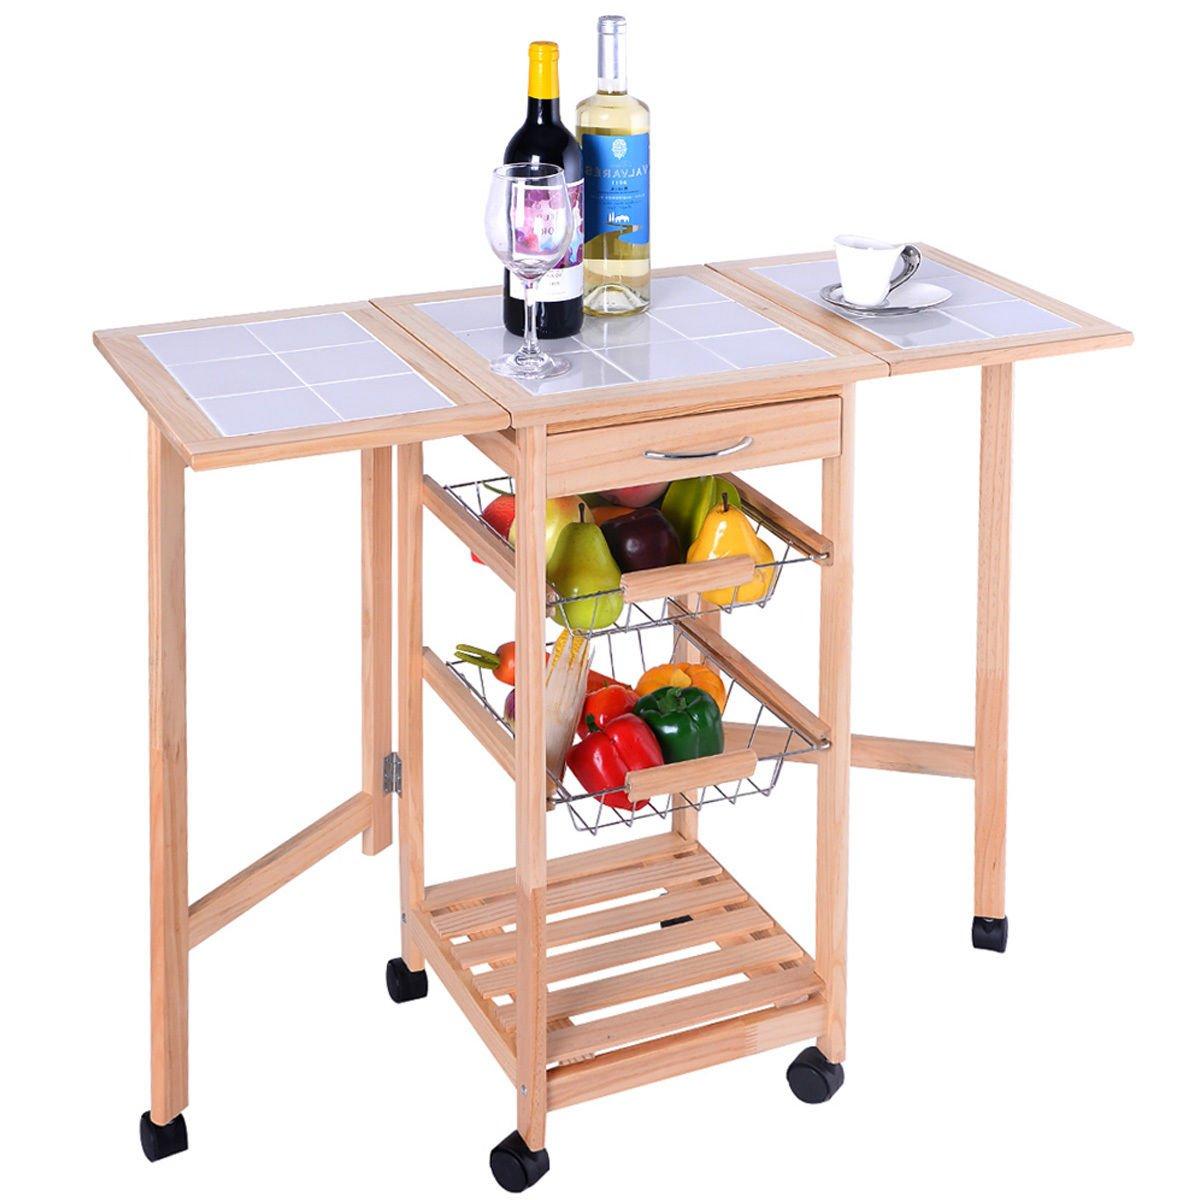 PROSPERLY U.S.Product Portable Rolling Wood Kitchen Trolley Cart Drop Leaf Storage Drawers Rack Basket by Prosperly (Image #2)